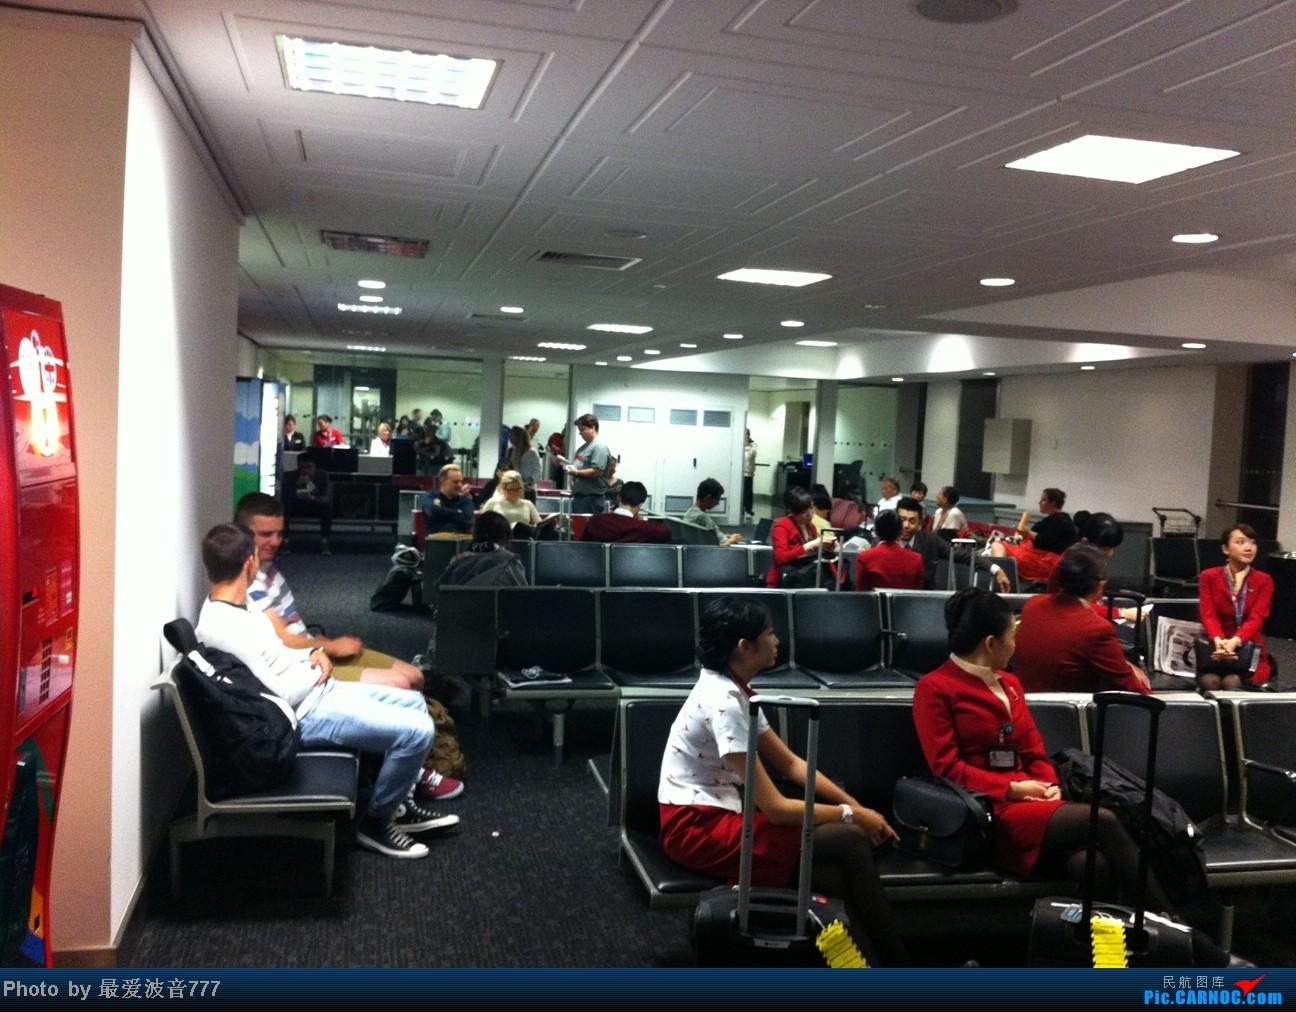 Re:[原创]假期的回国往返之旅 LHR-HKG-CTU-HKG-LHR, CX+CA+KA联合运营    英国伦敦希思罗机场